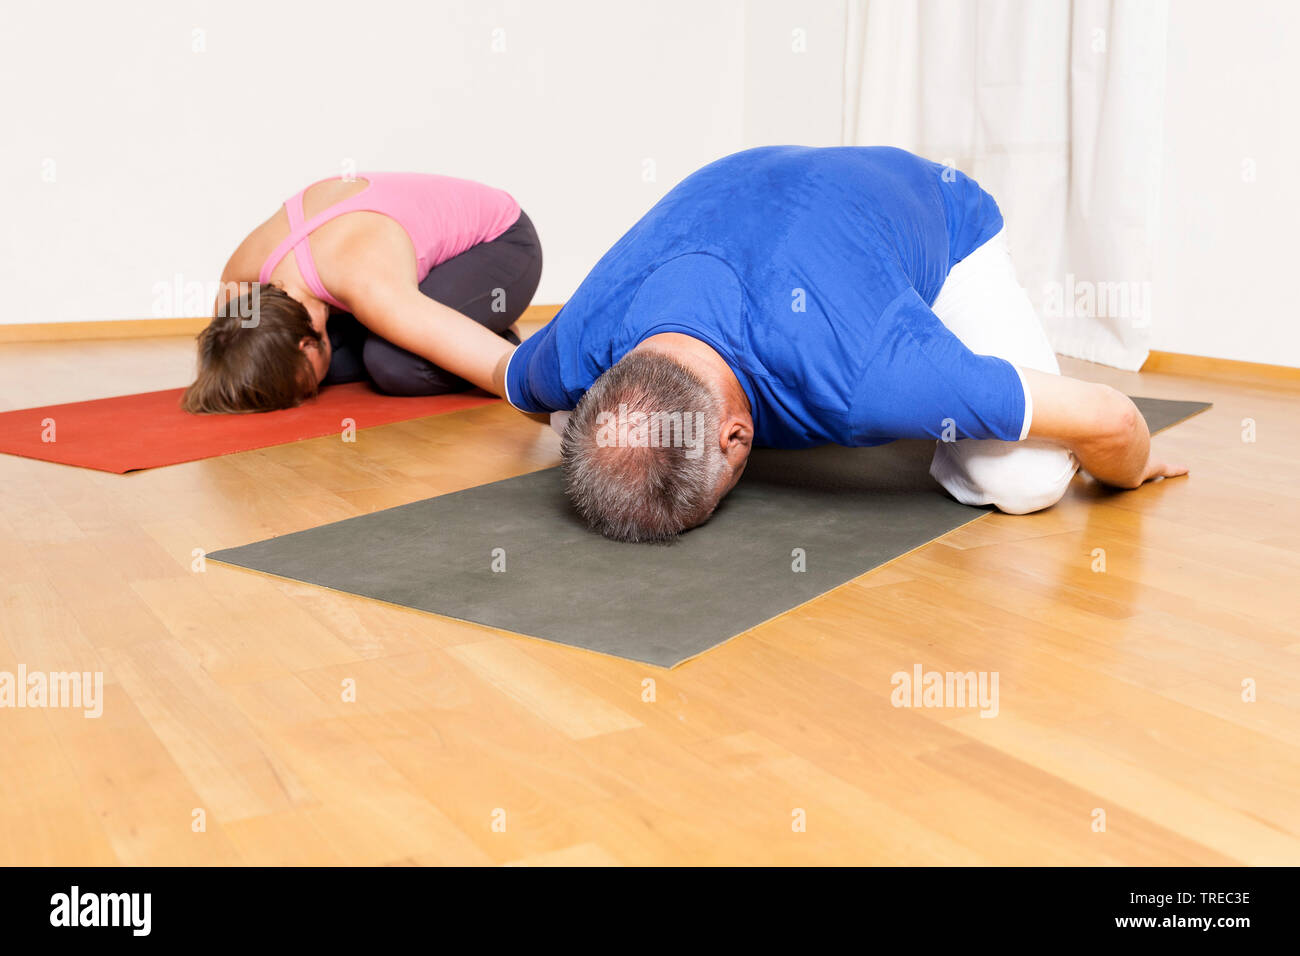 Frau und Mann machen Yoga-Uebungen, Europa | woman and man doing yoga, Europe | BLWS522592.jpg [ (c) blickwinkel/McPHOTO/M. Gann Tel. +49 (0)2302-2793 Stock Photo